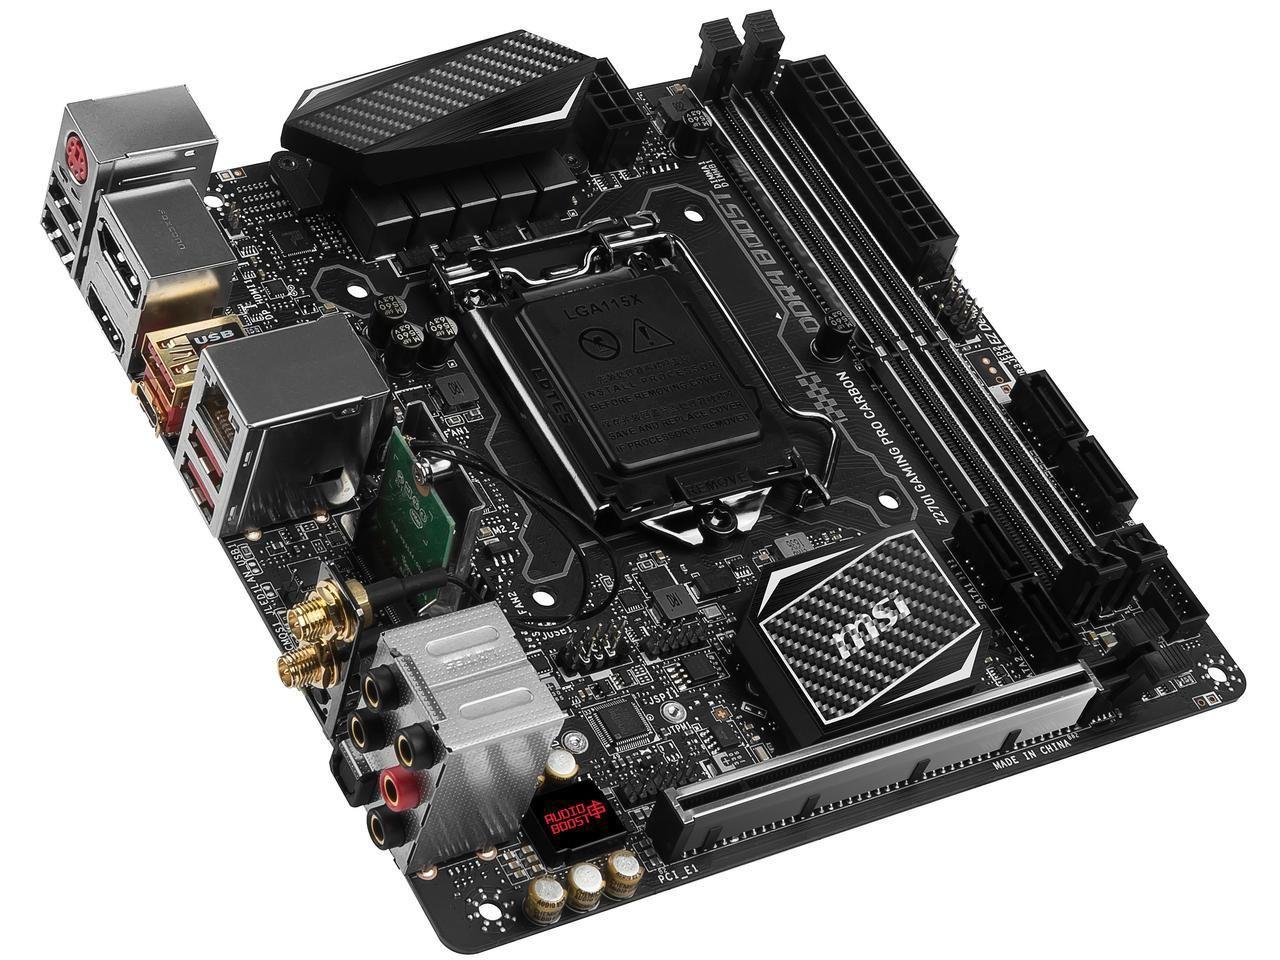 Msi Z270i Gaming Pro Carbon Ac Lga 1151 Intel Z270 Hdmi Sata 6gb S Usb 3 1 Mini Itx Intel Motherboard Newegg Com Mini Itx Gaming Computer Graphic Card